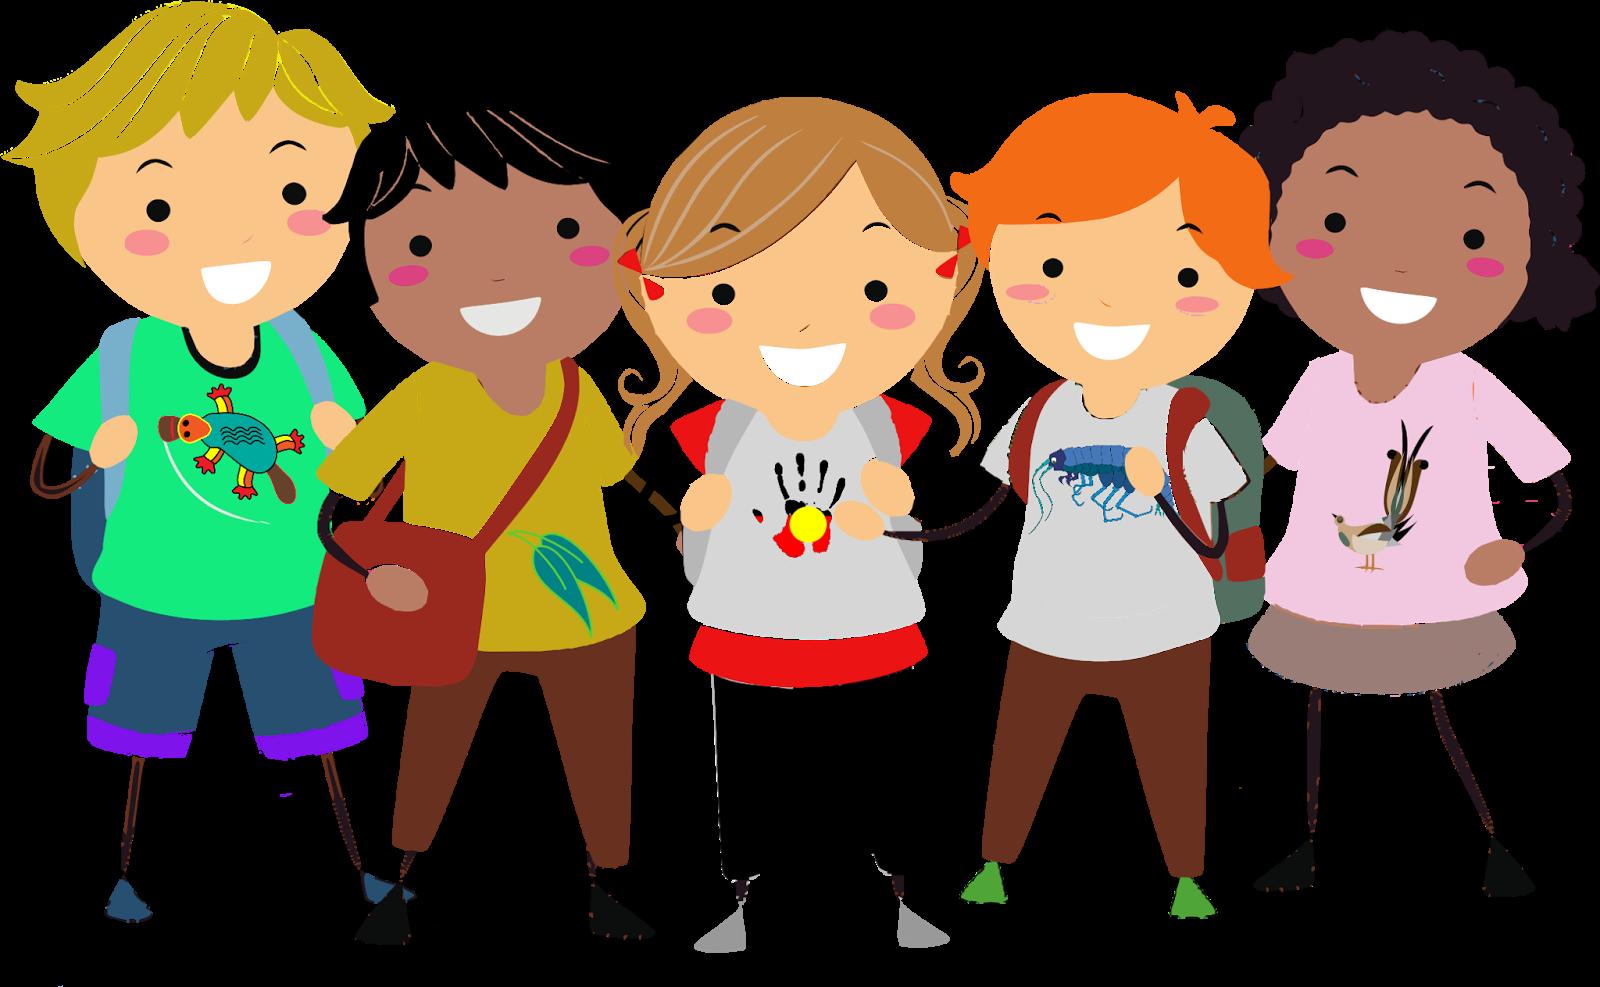 Cara Terbaik Mendidik Anak Agar Menjadi Baik